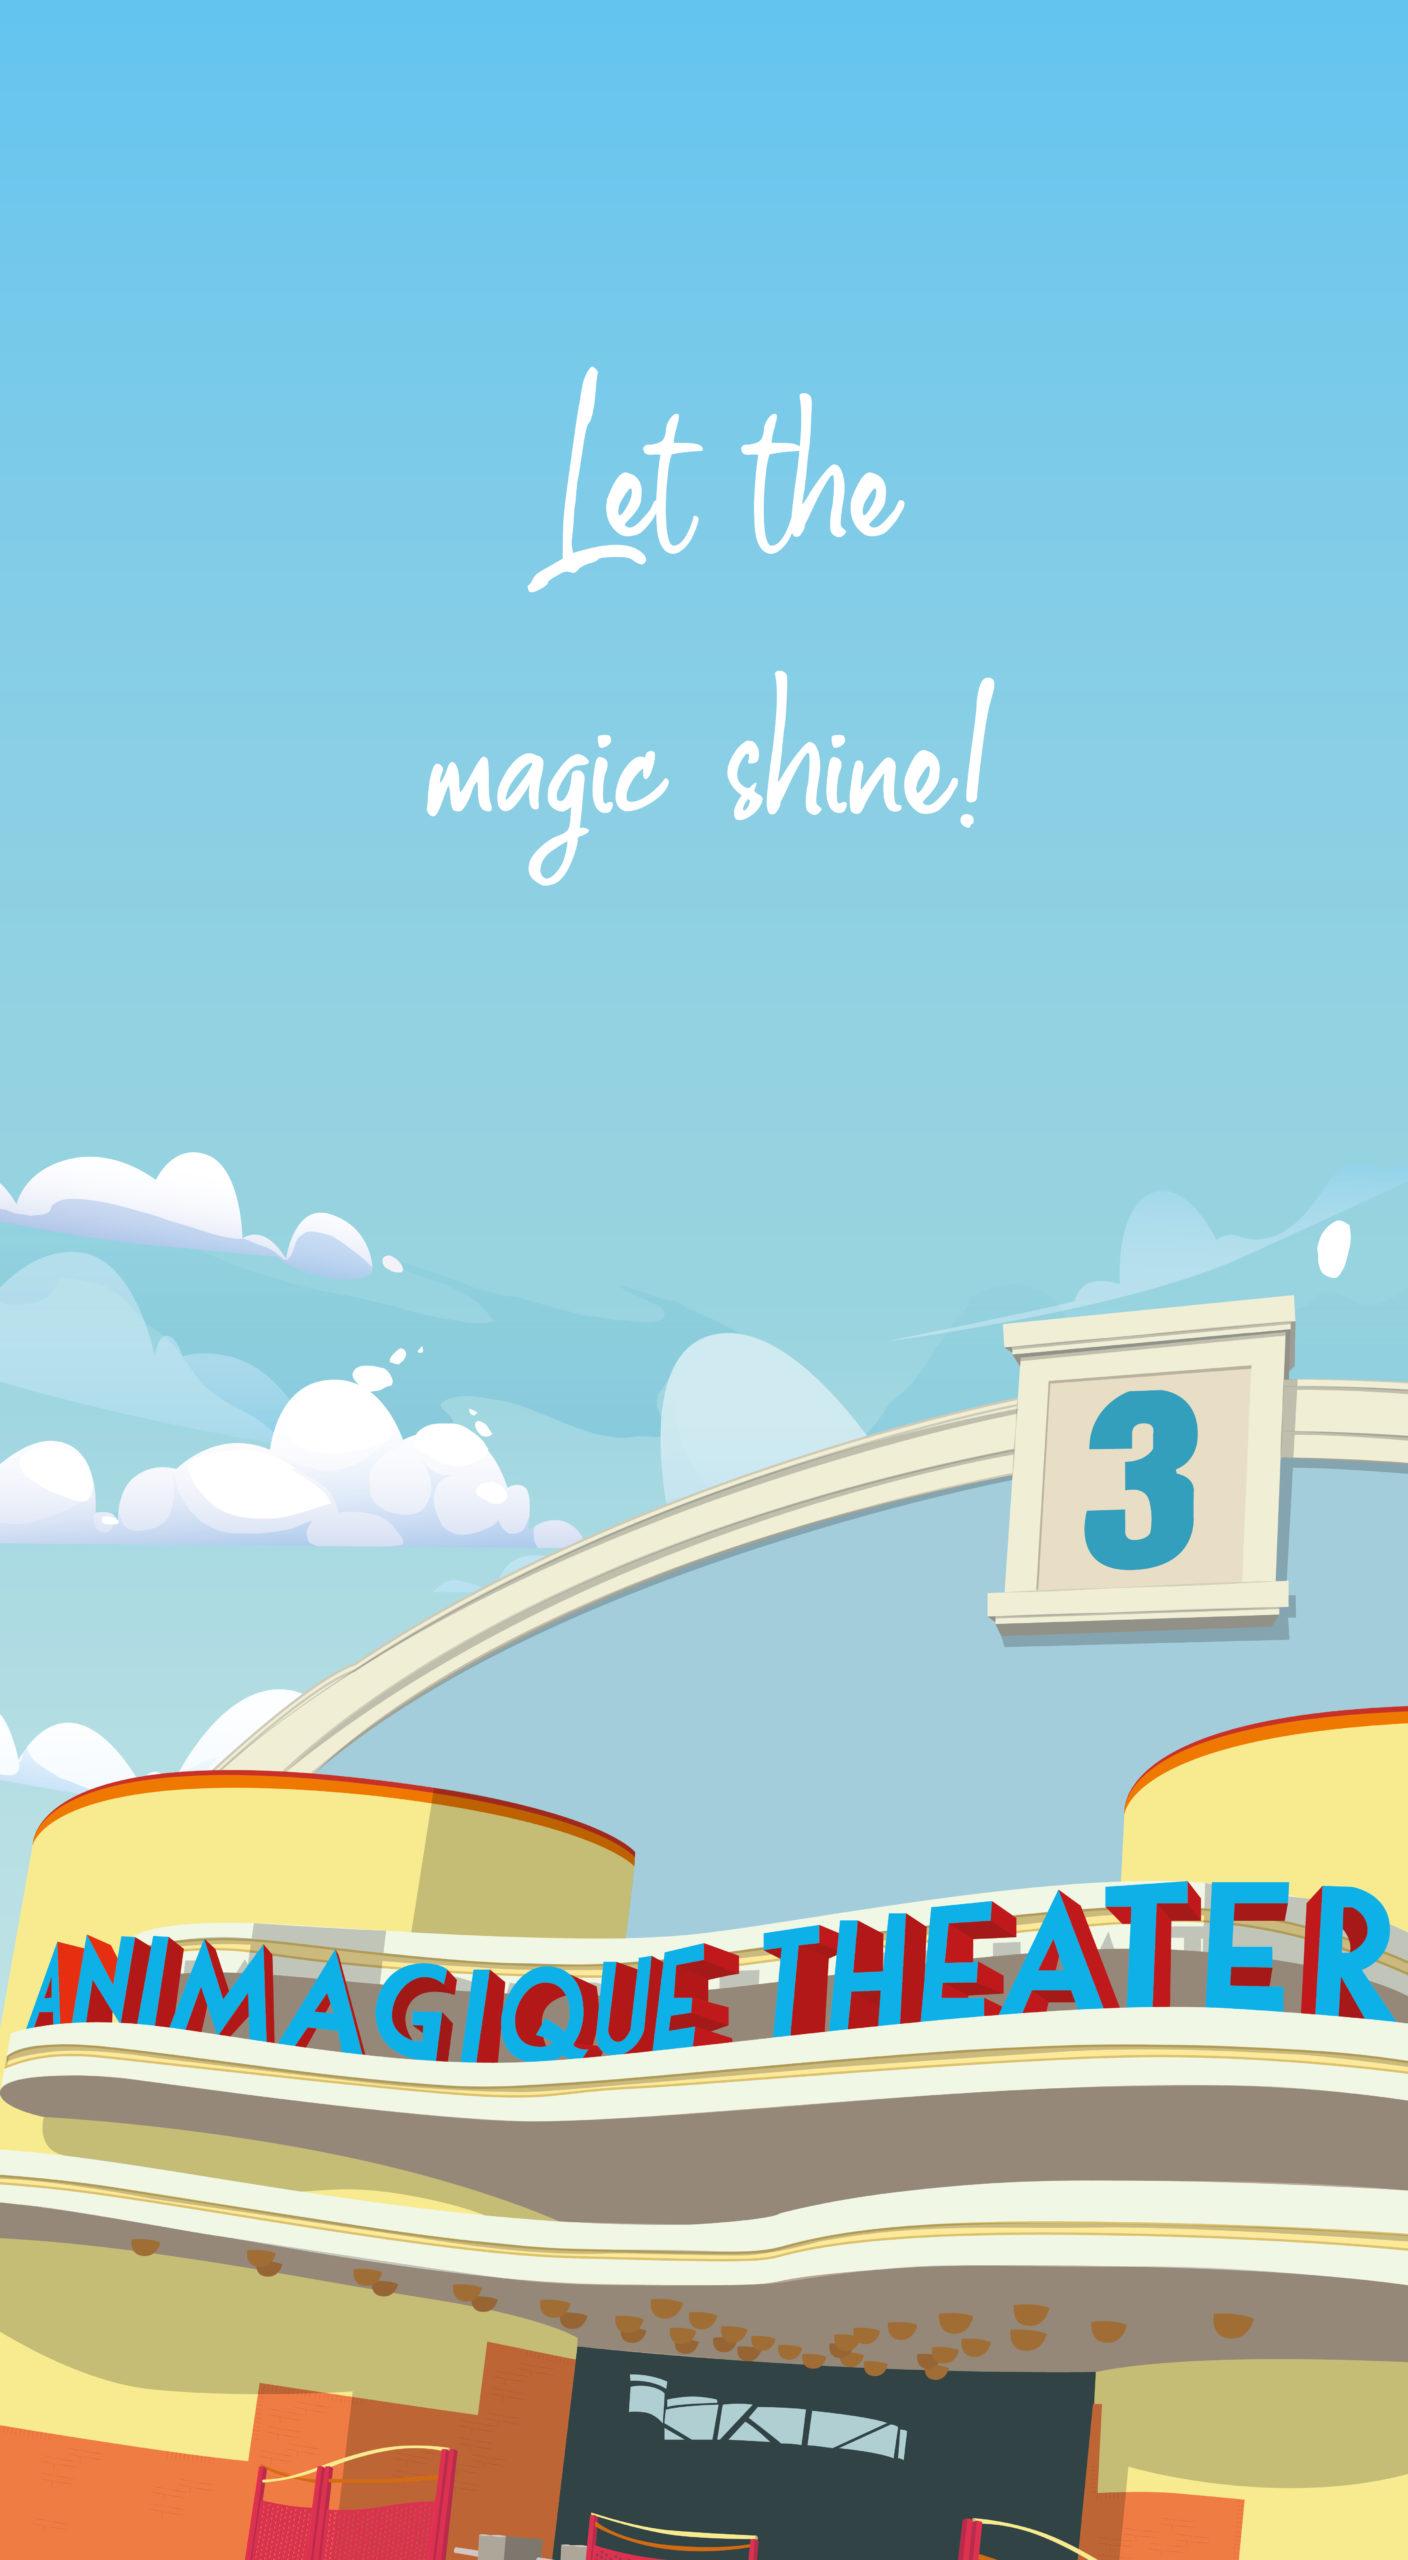 Animagique-Theater-waltdisneystudios